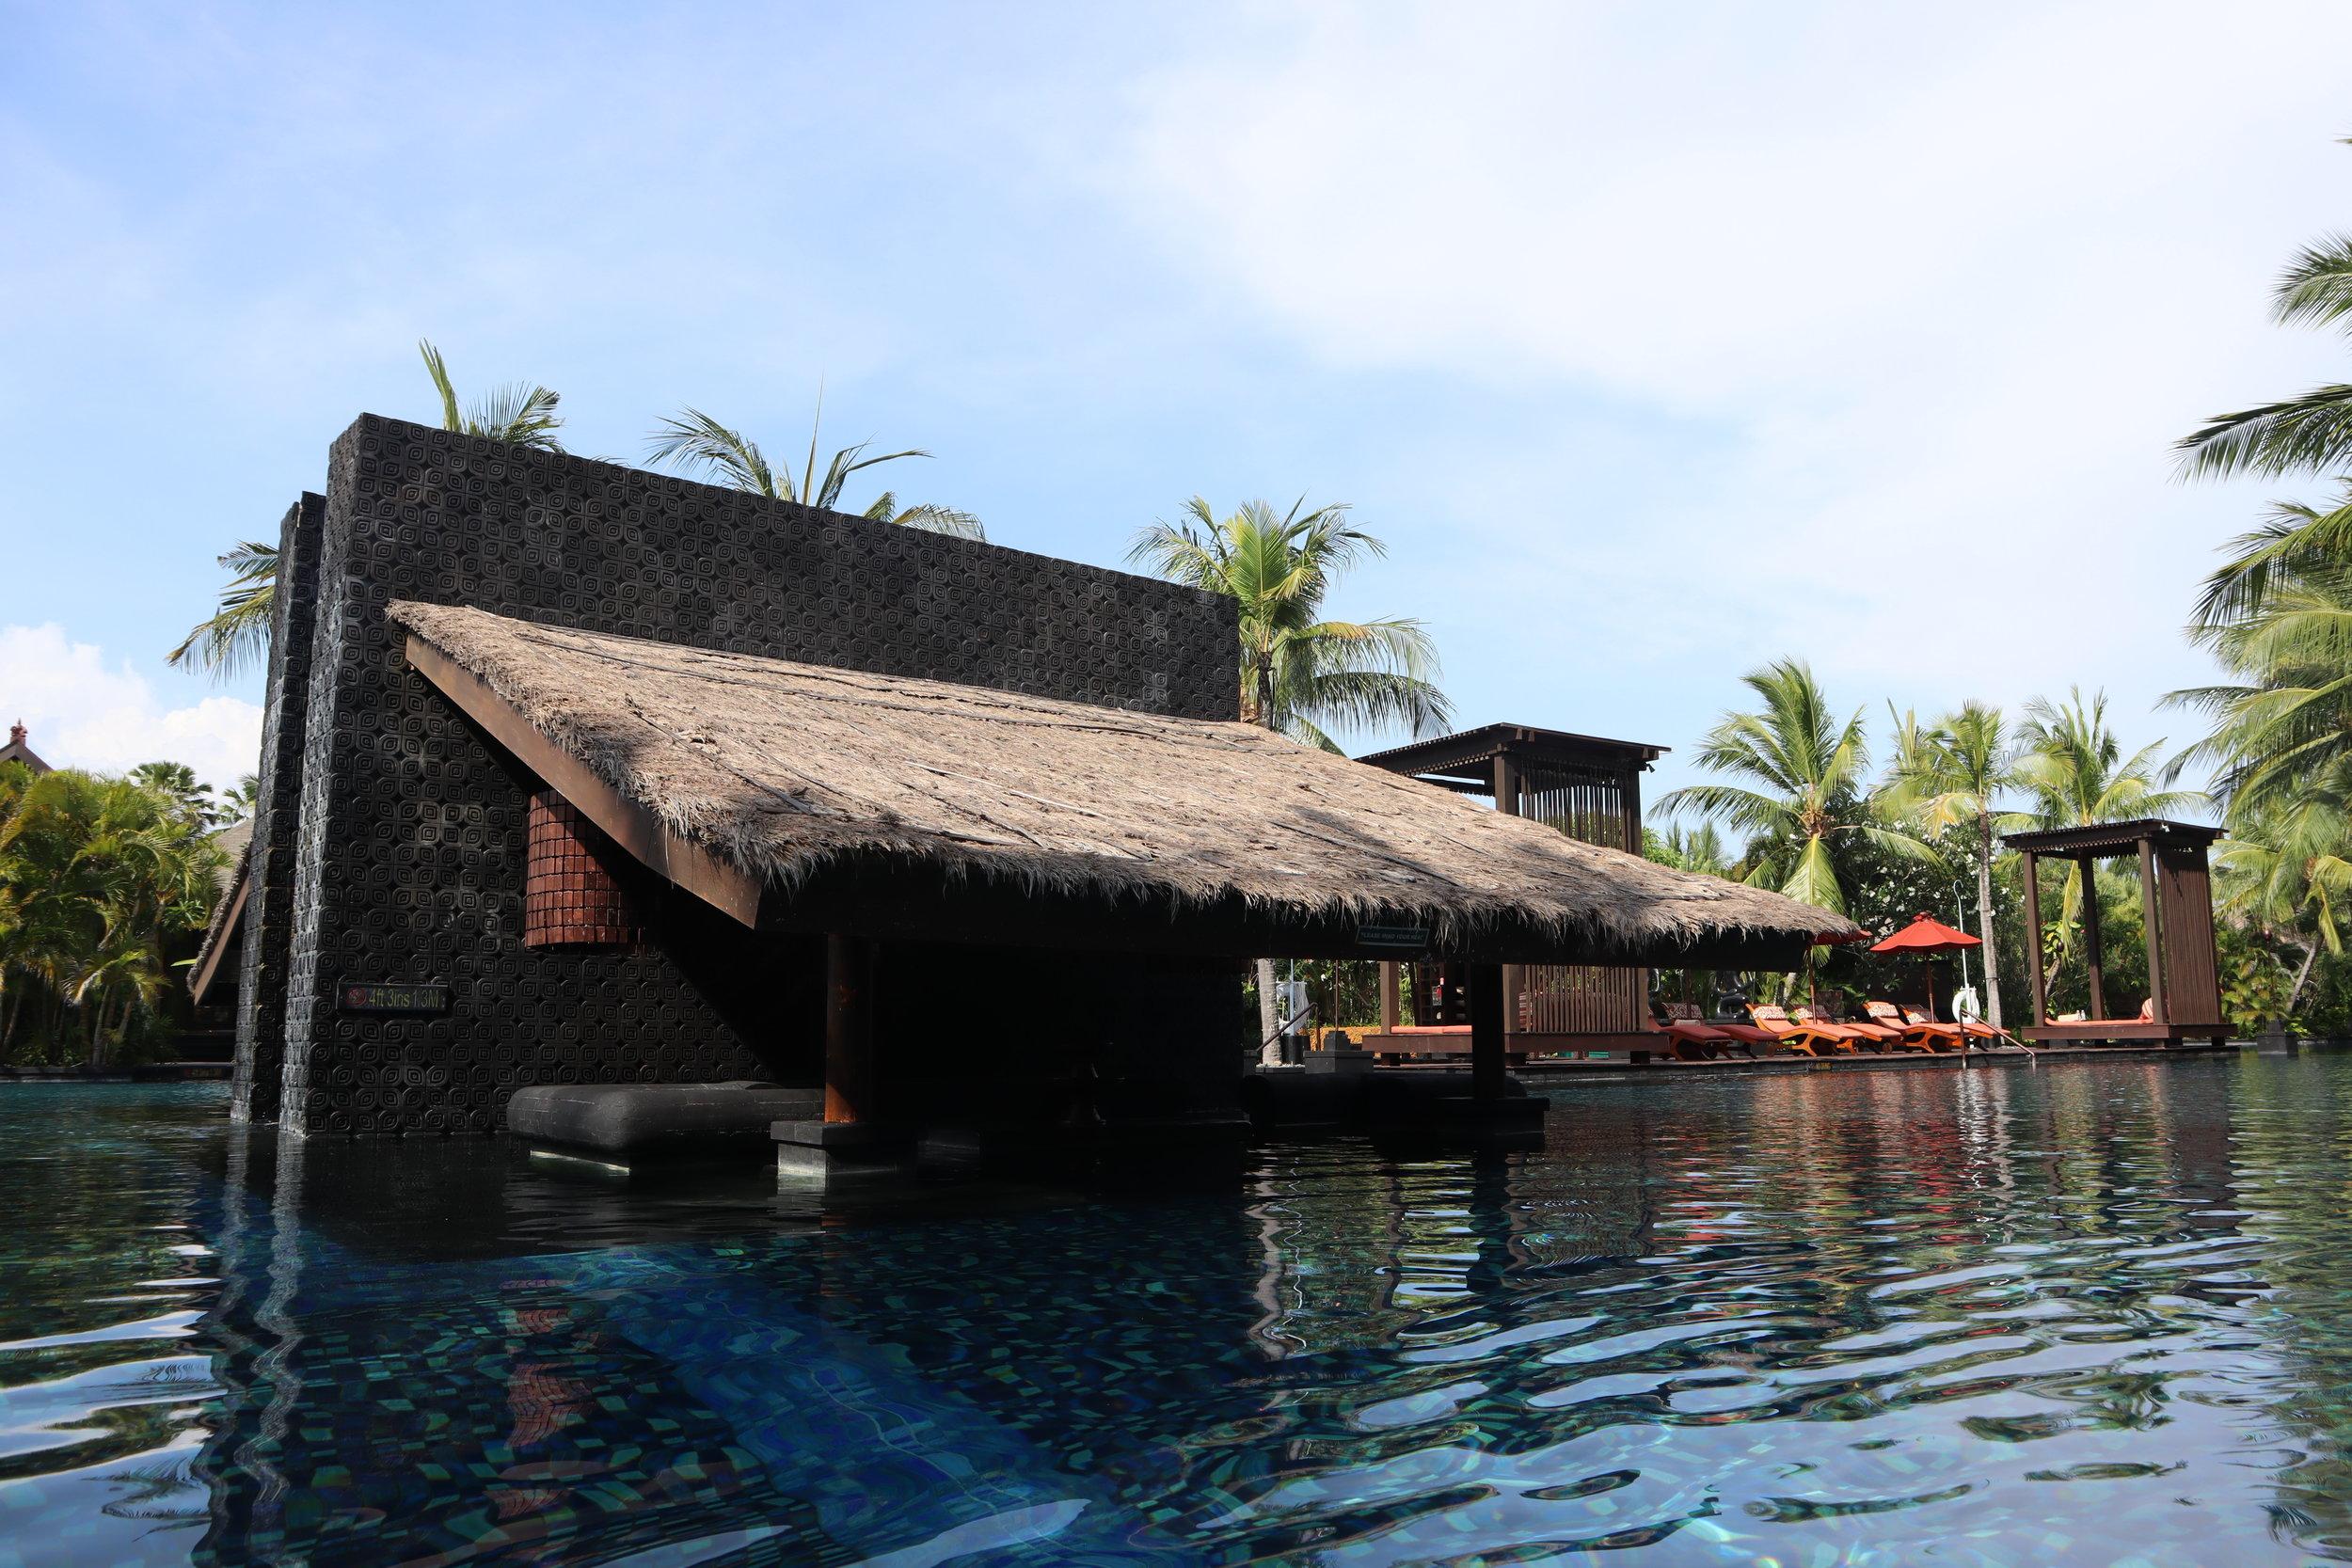 St. Regis Bali – Saltwater lagoon underwater house